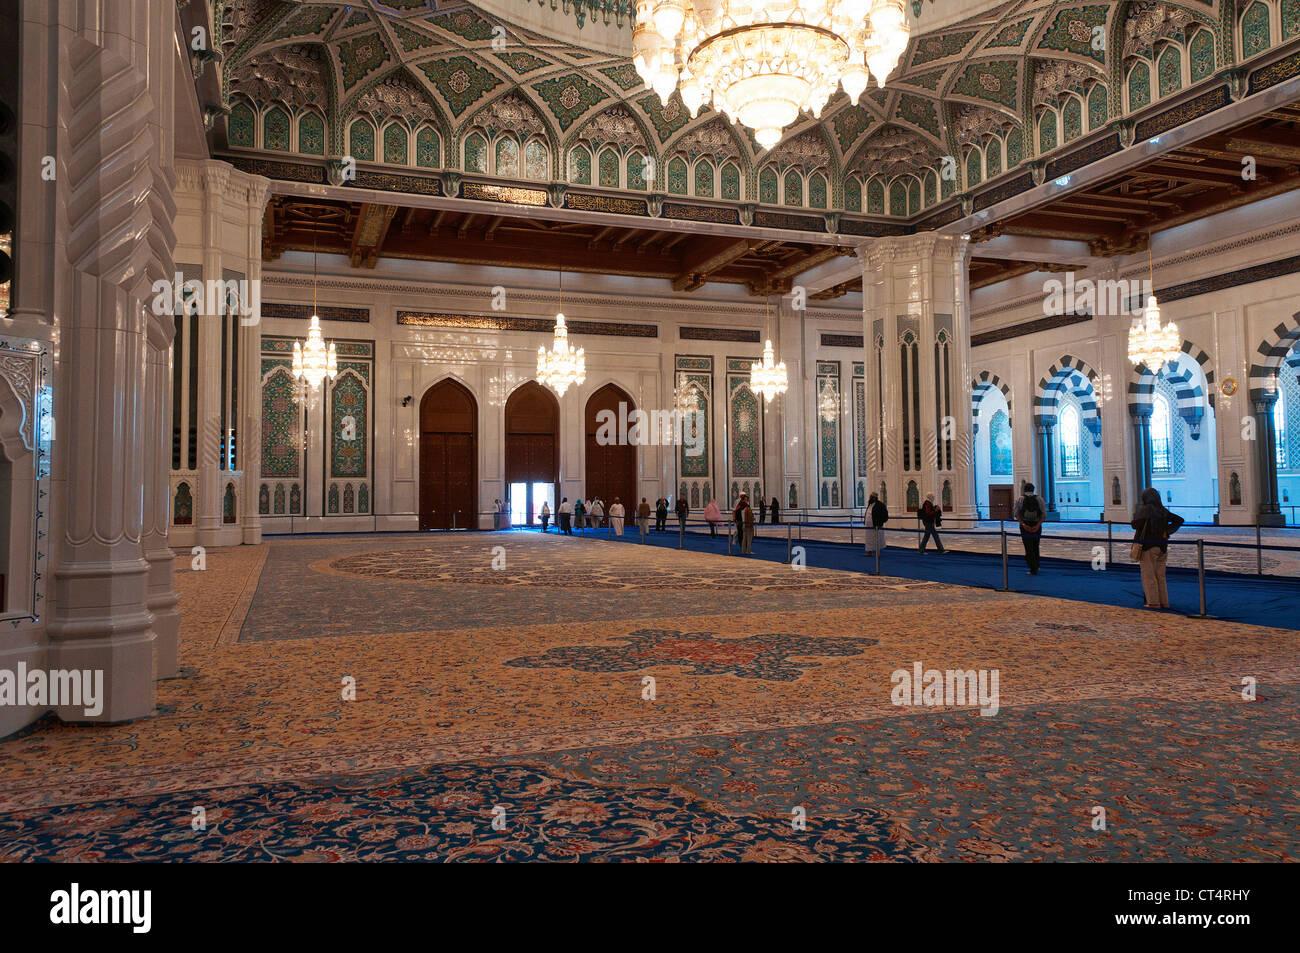 Elk207-1345 Oman, Muscat, Al Ghubrah, Sultan Qaboos Grand Mosque, prayer hall - Stock Image